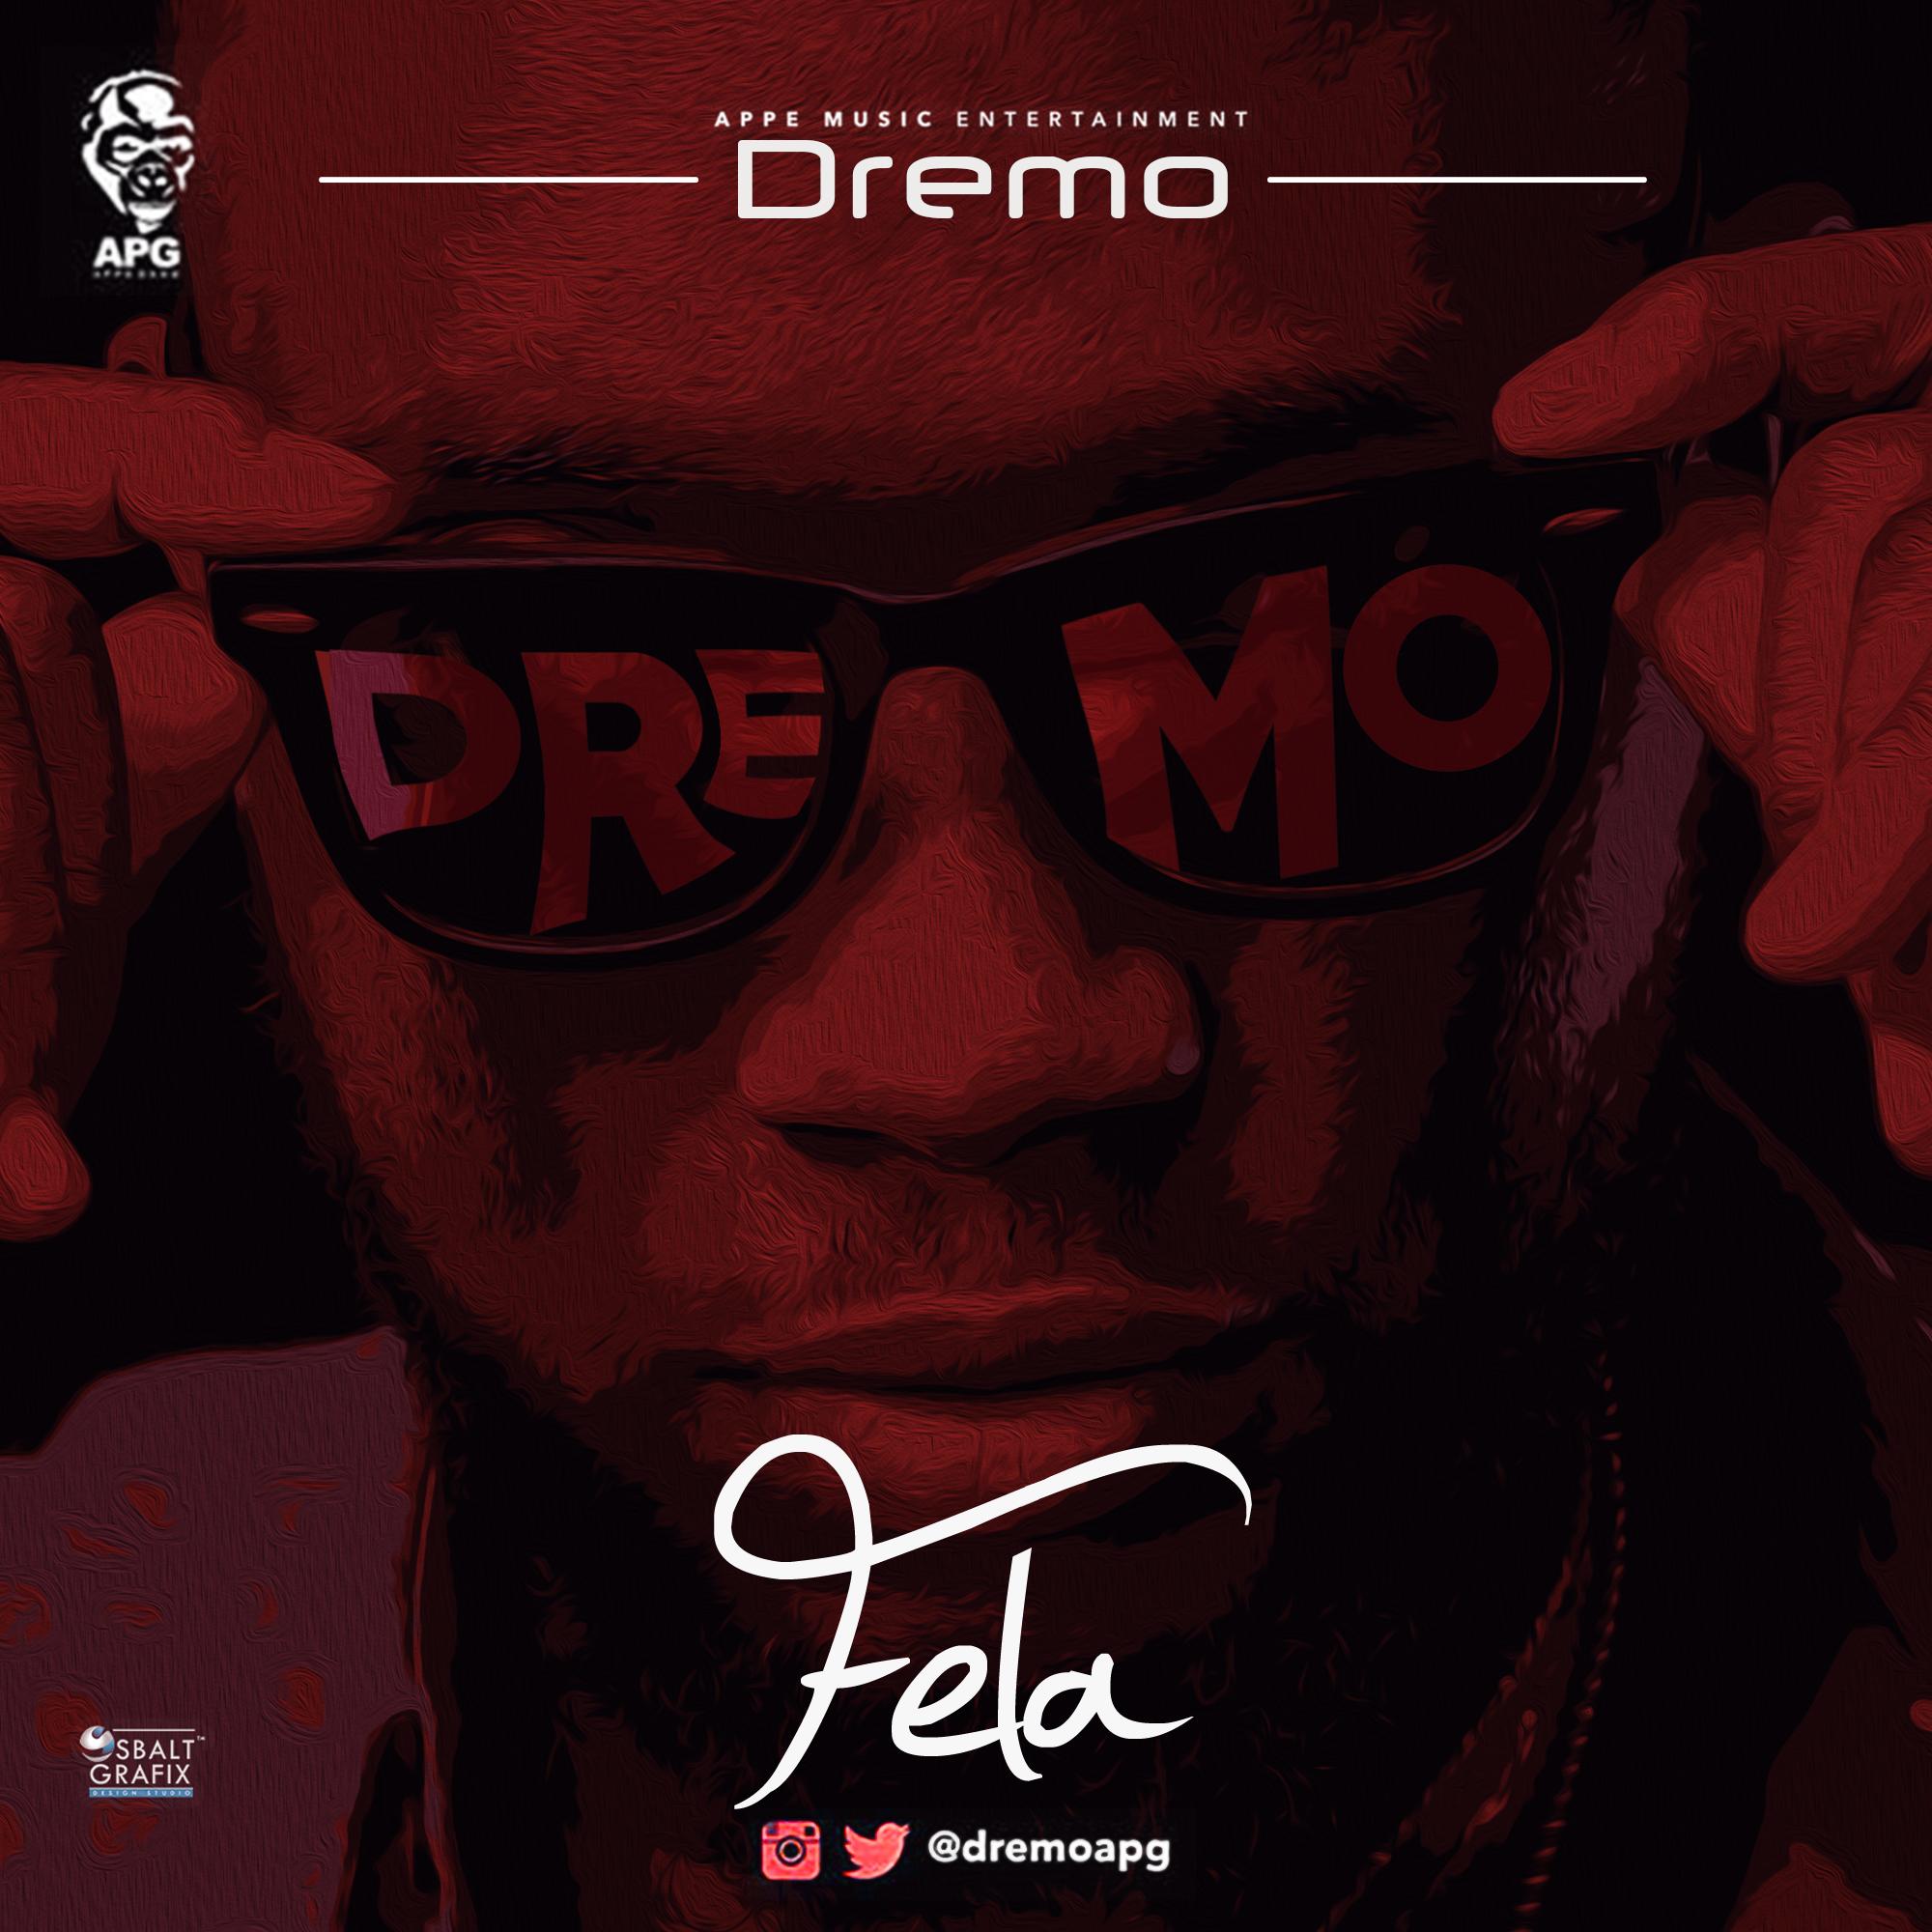 Dremo - Fela